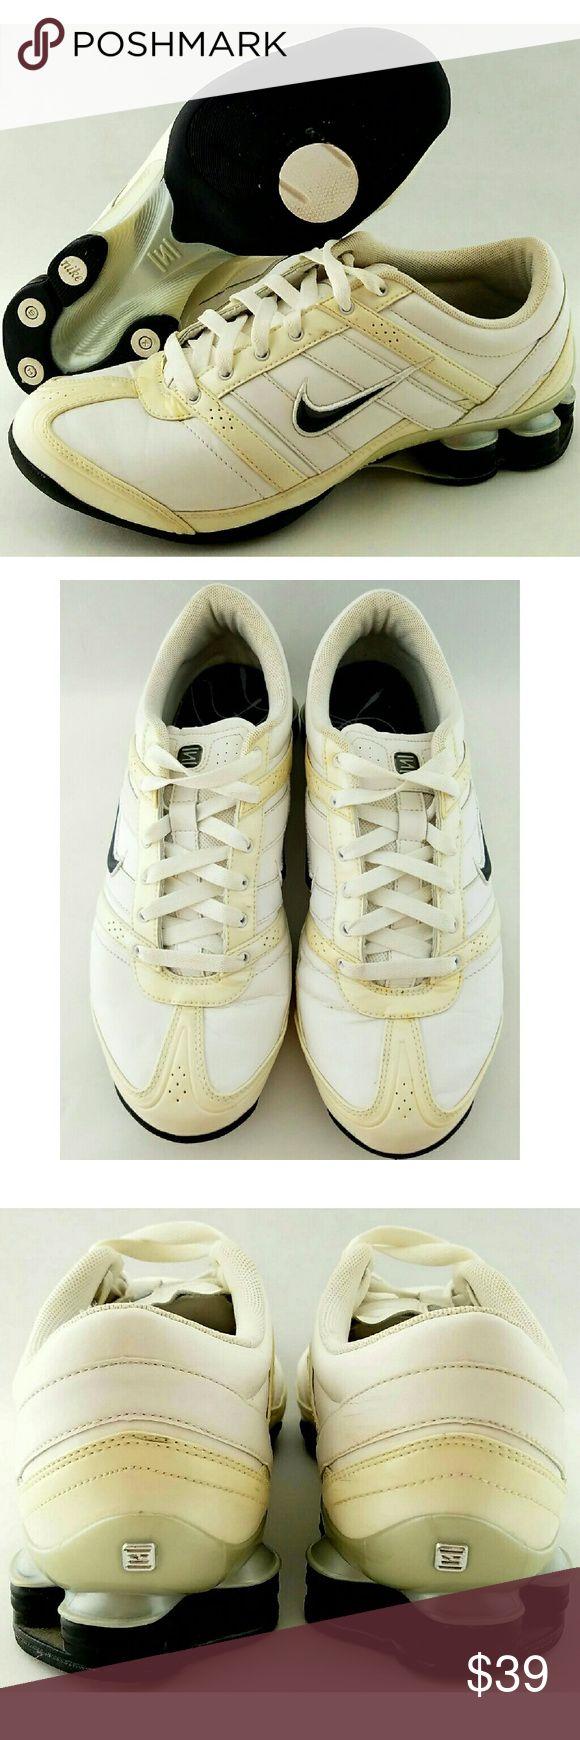 buy online 1ed1a 4ba52 ... shox current khaki  nike shox electro white running training sneakers  womens nike ...